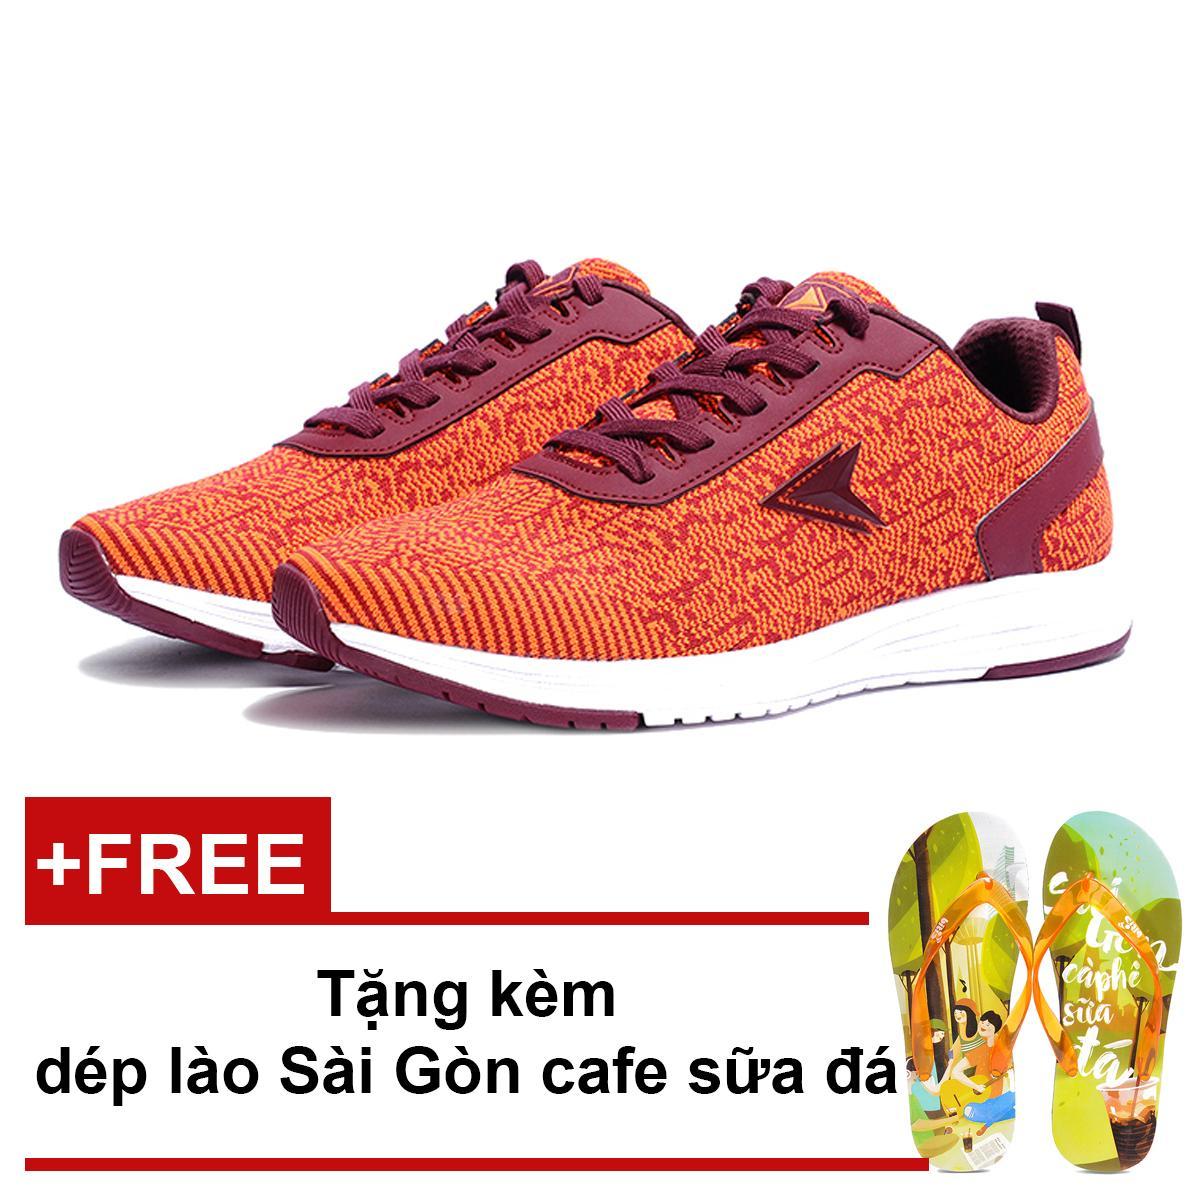 Giá Bán Giay Thế Thao Nữ Bitis Hunter Dark Tribal Orange Dsw057333Cam Tặng Dep Lao Sai Gon Cafe Sữa Đa Tốt Nhất